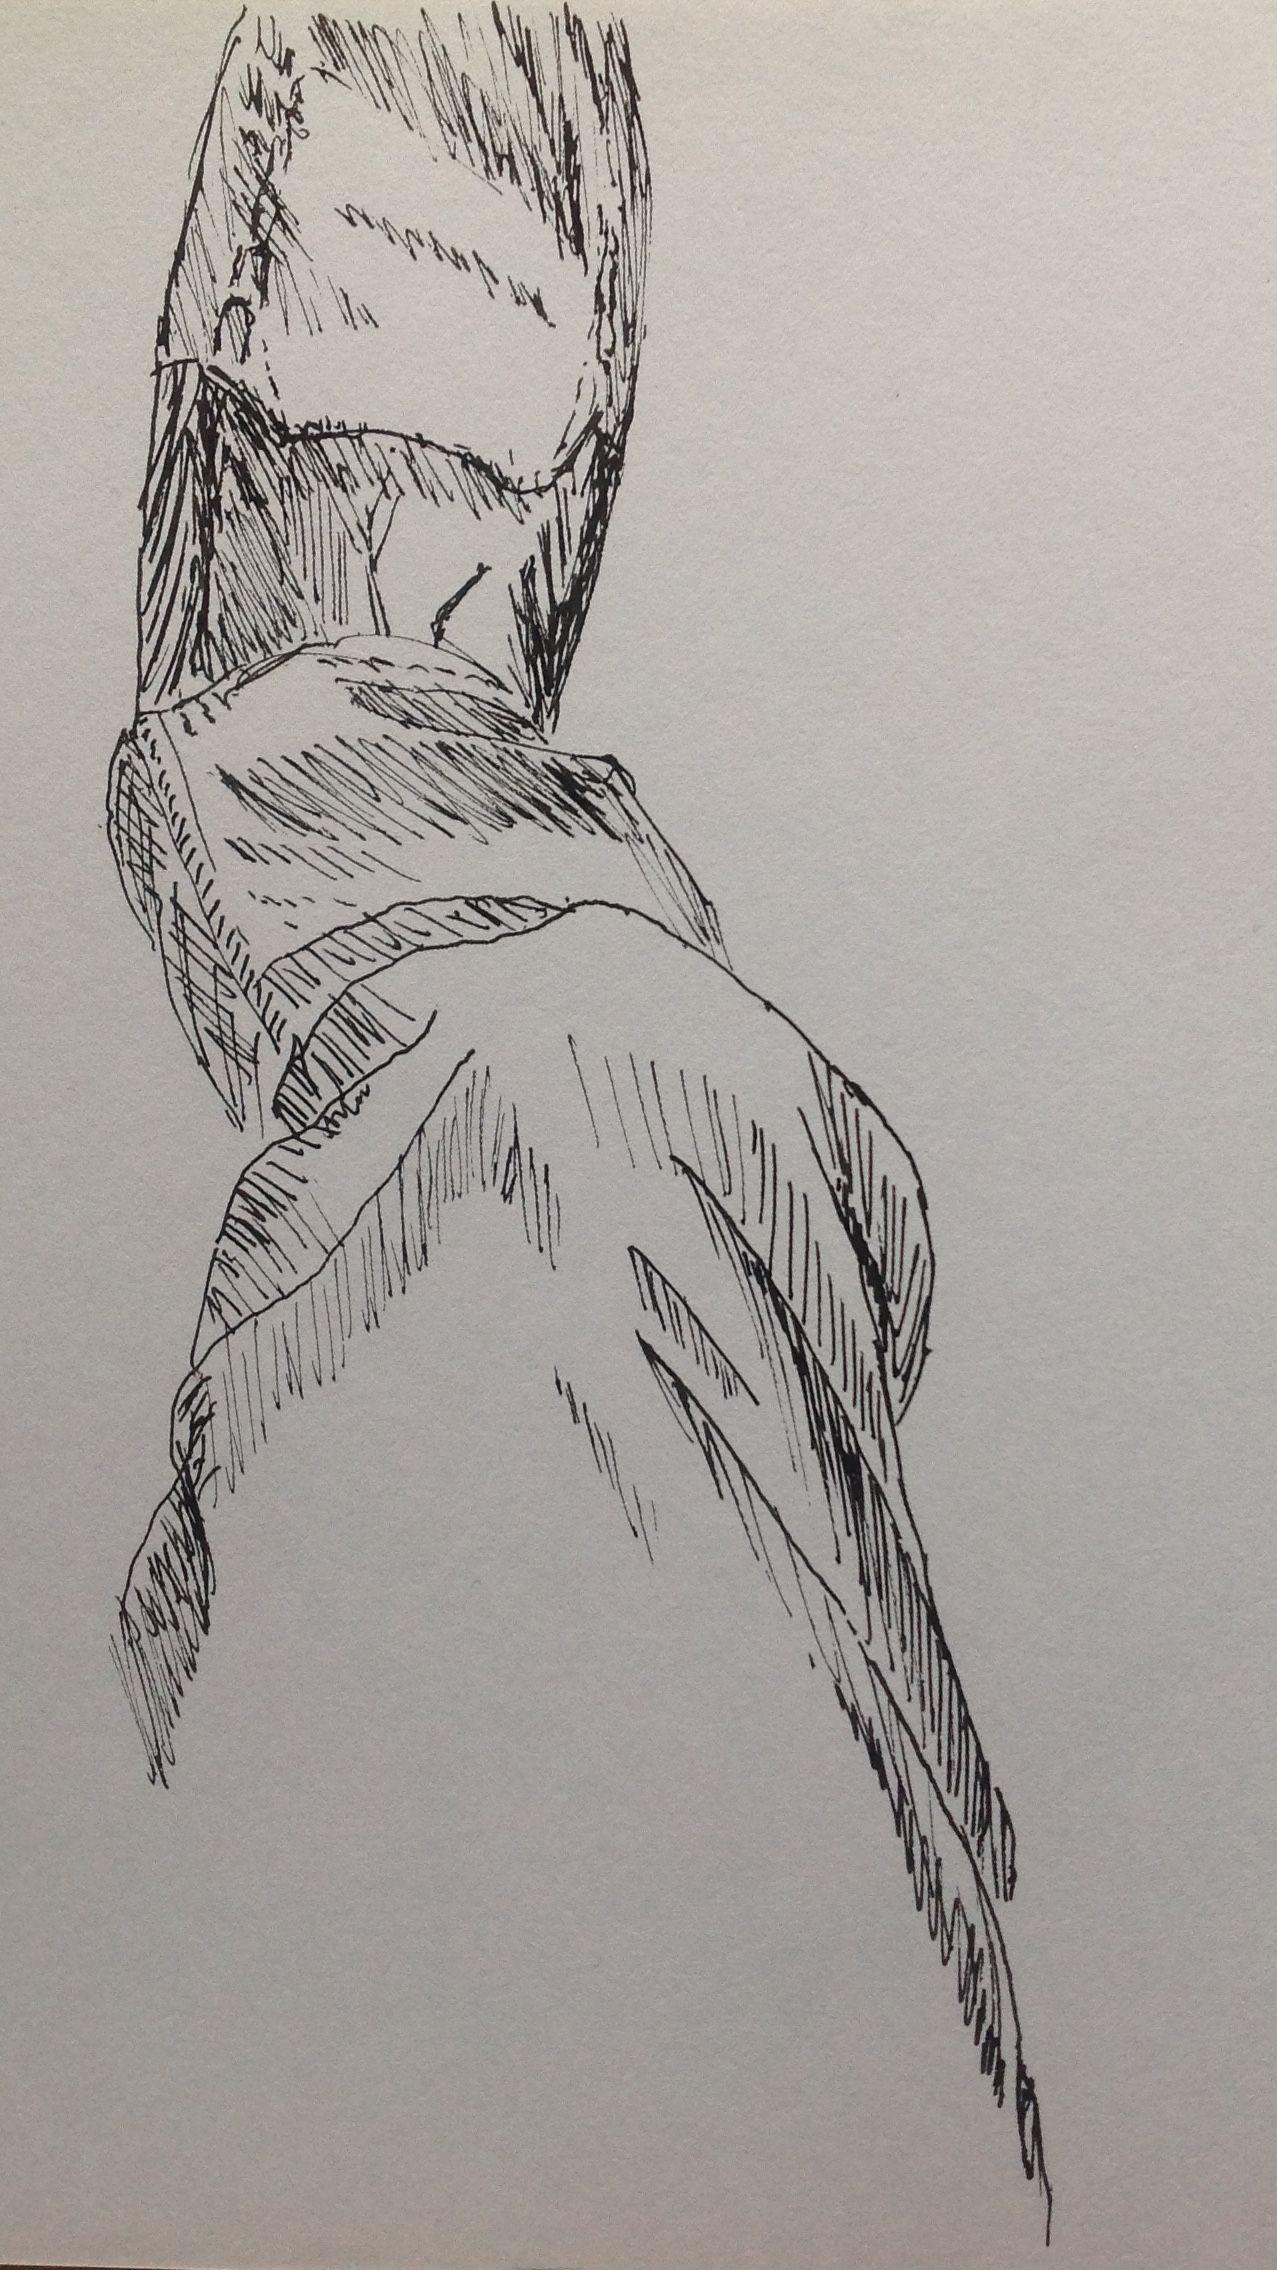 1277x2270 Monsoon Season Drawing. My Leg, Footnd Slipper. Drawn